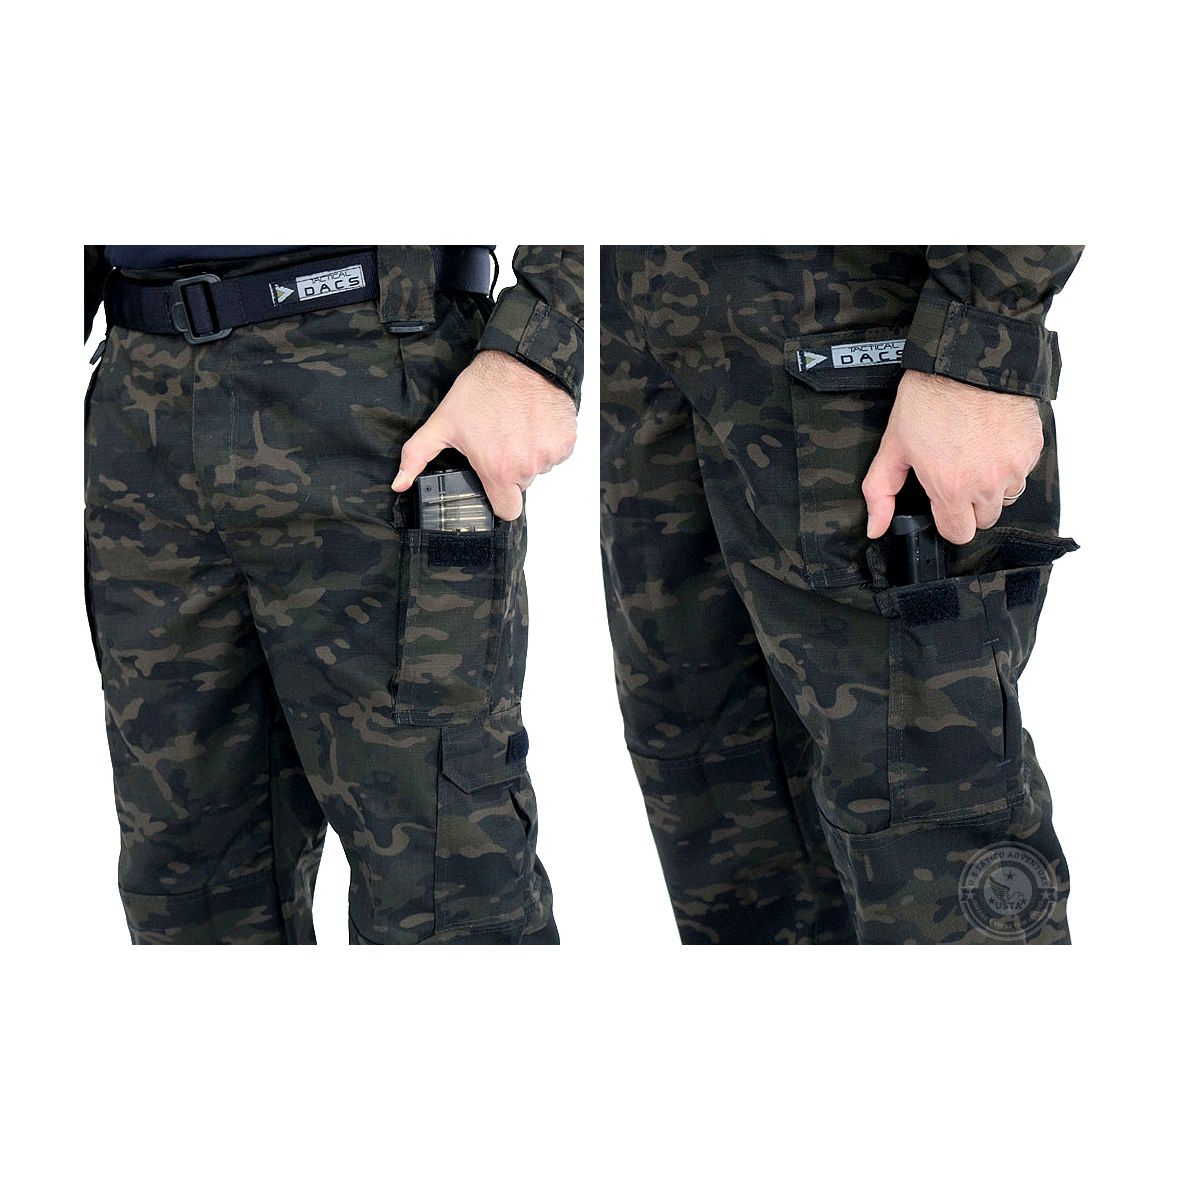 Farda Militar Uniforme Tático HRT Multicam Black Tactical Dacs